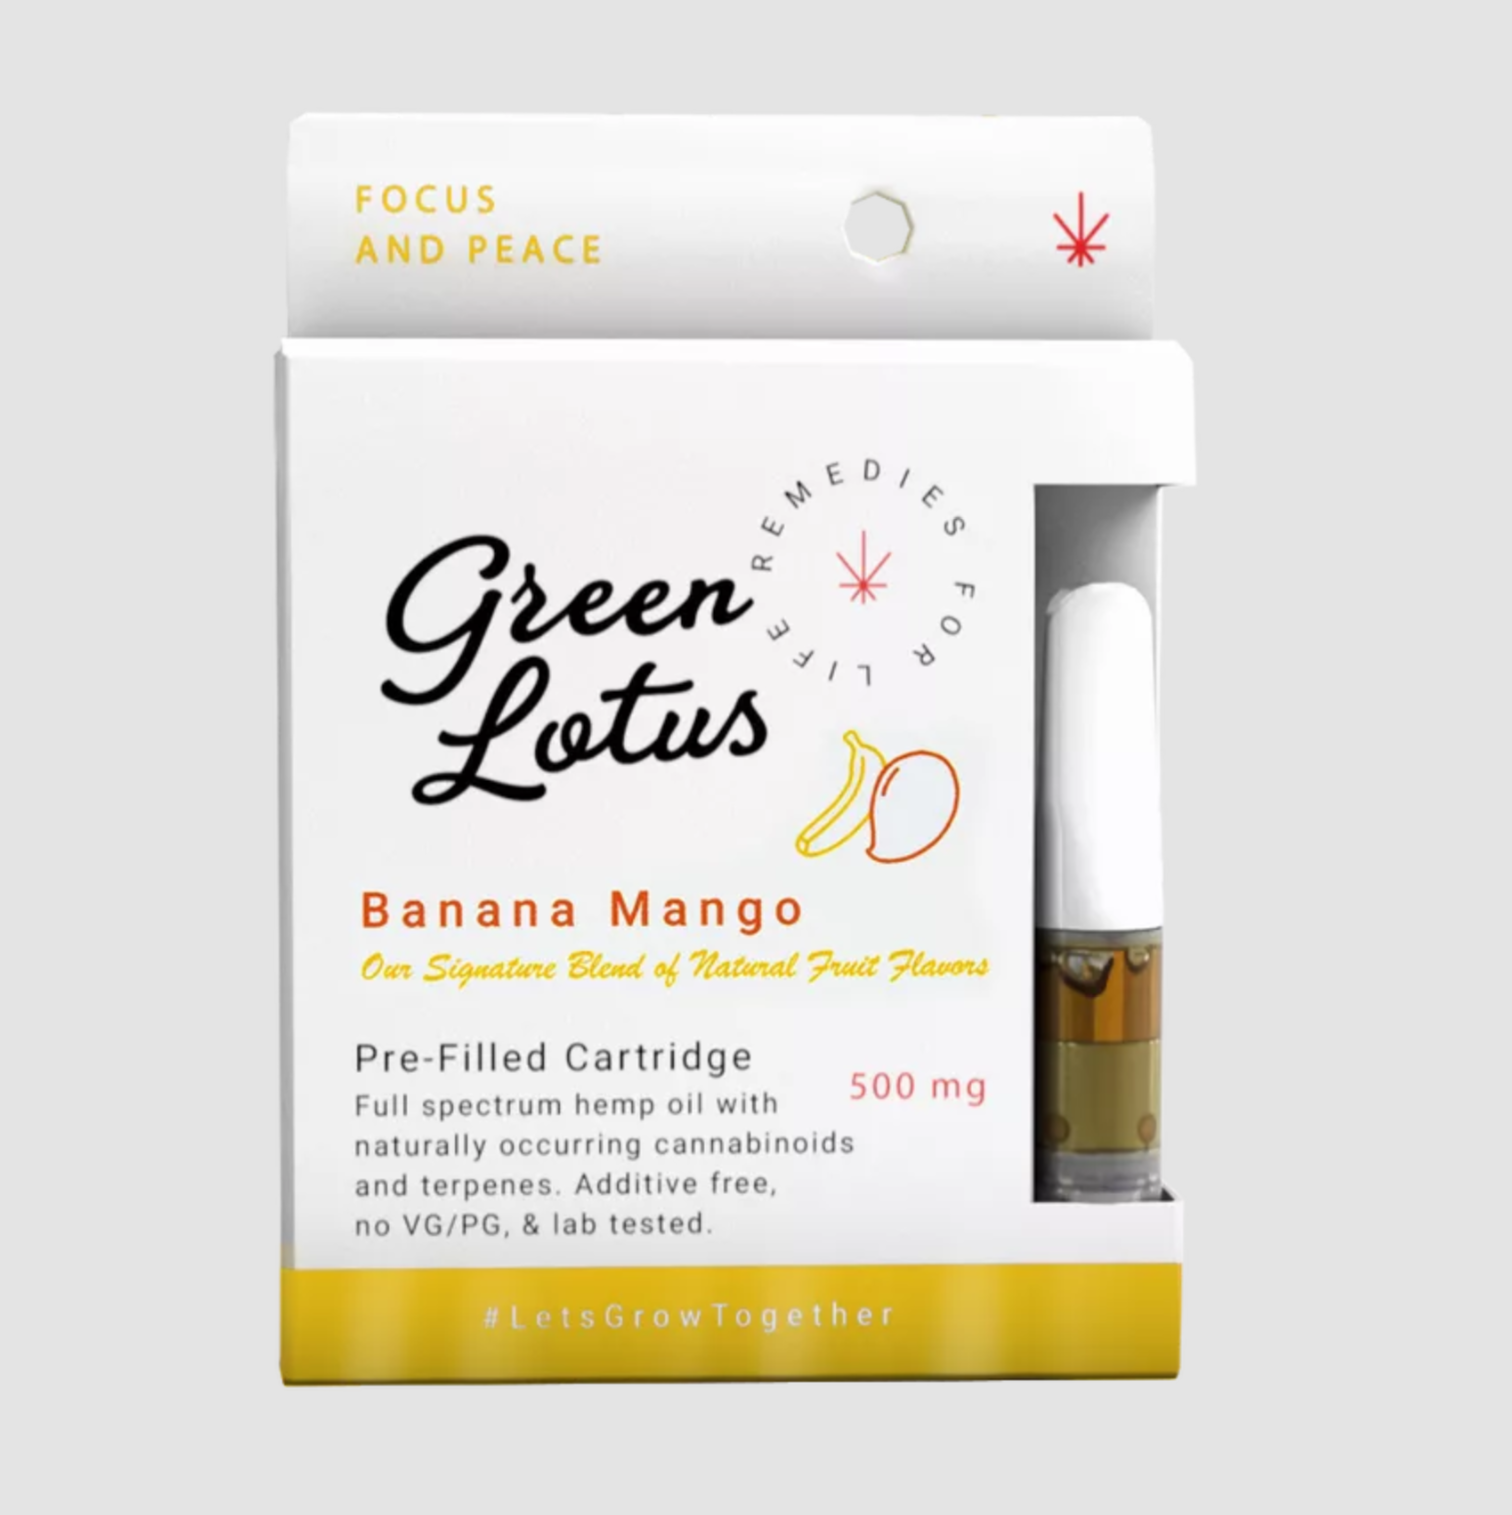 Green Lotus CBD Vape Cartridge Banana Mango 500mg